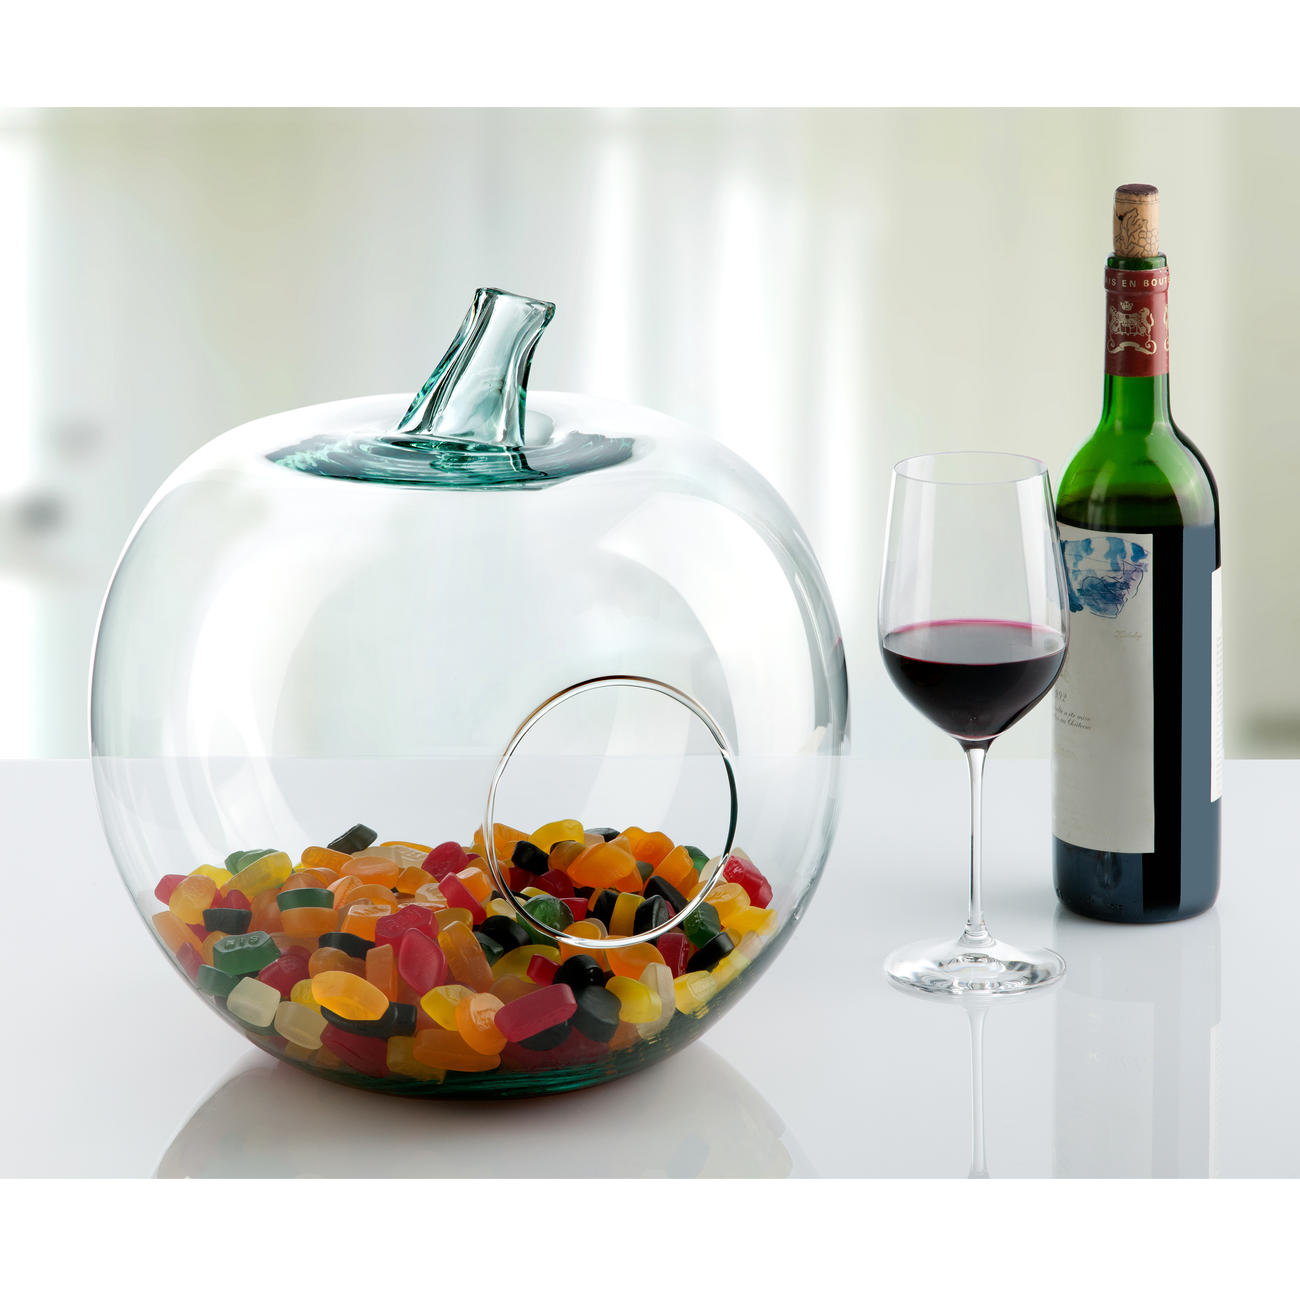 Casablanca Deko-Glas-Apfel Windlicht, 36 Cm H, 31 Cm